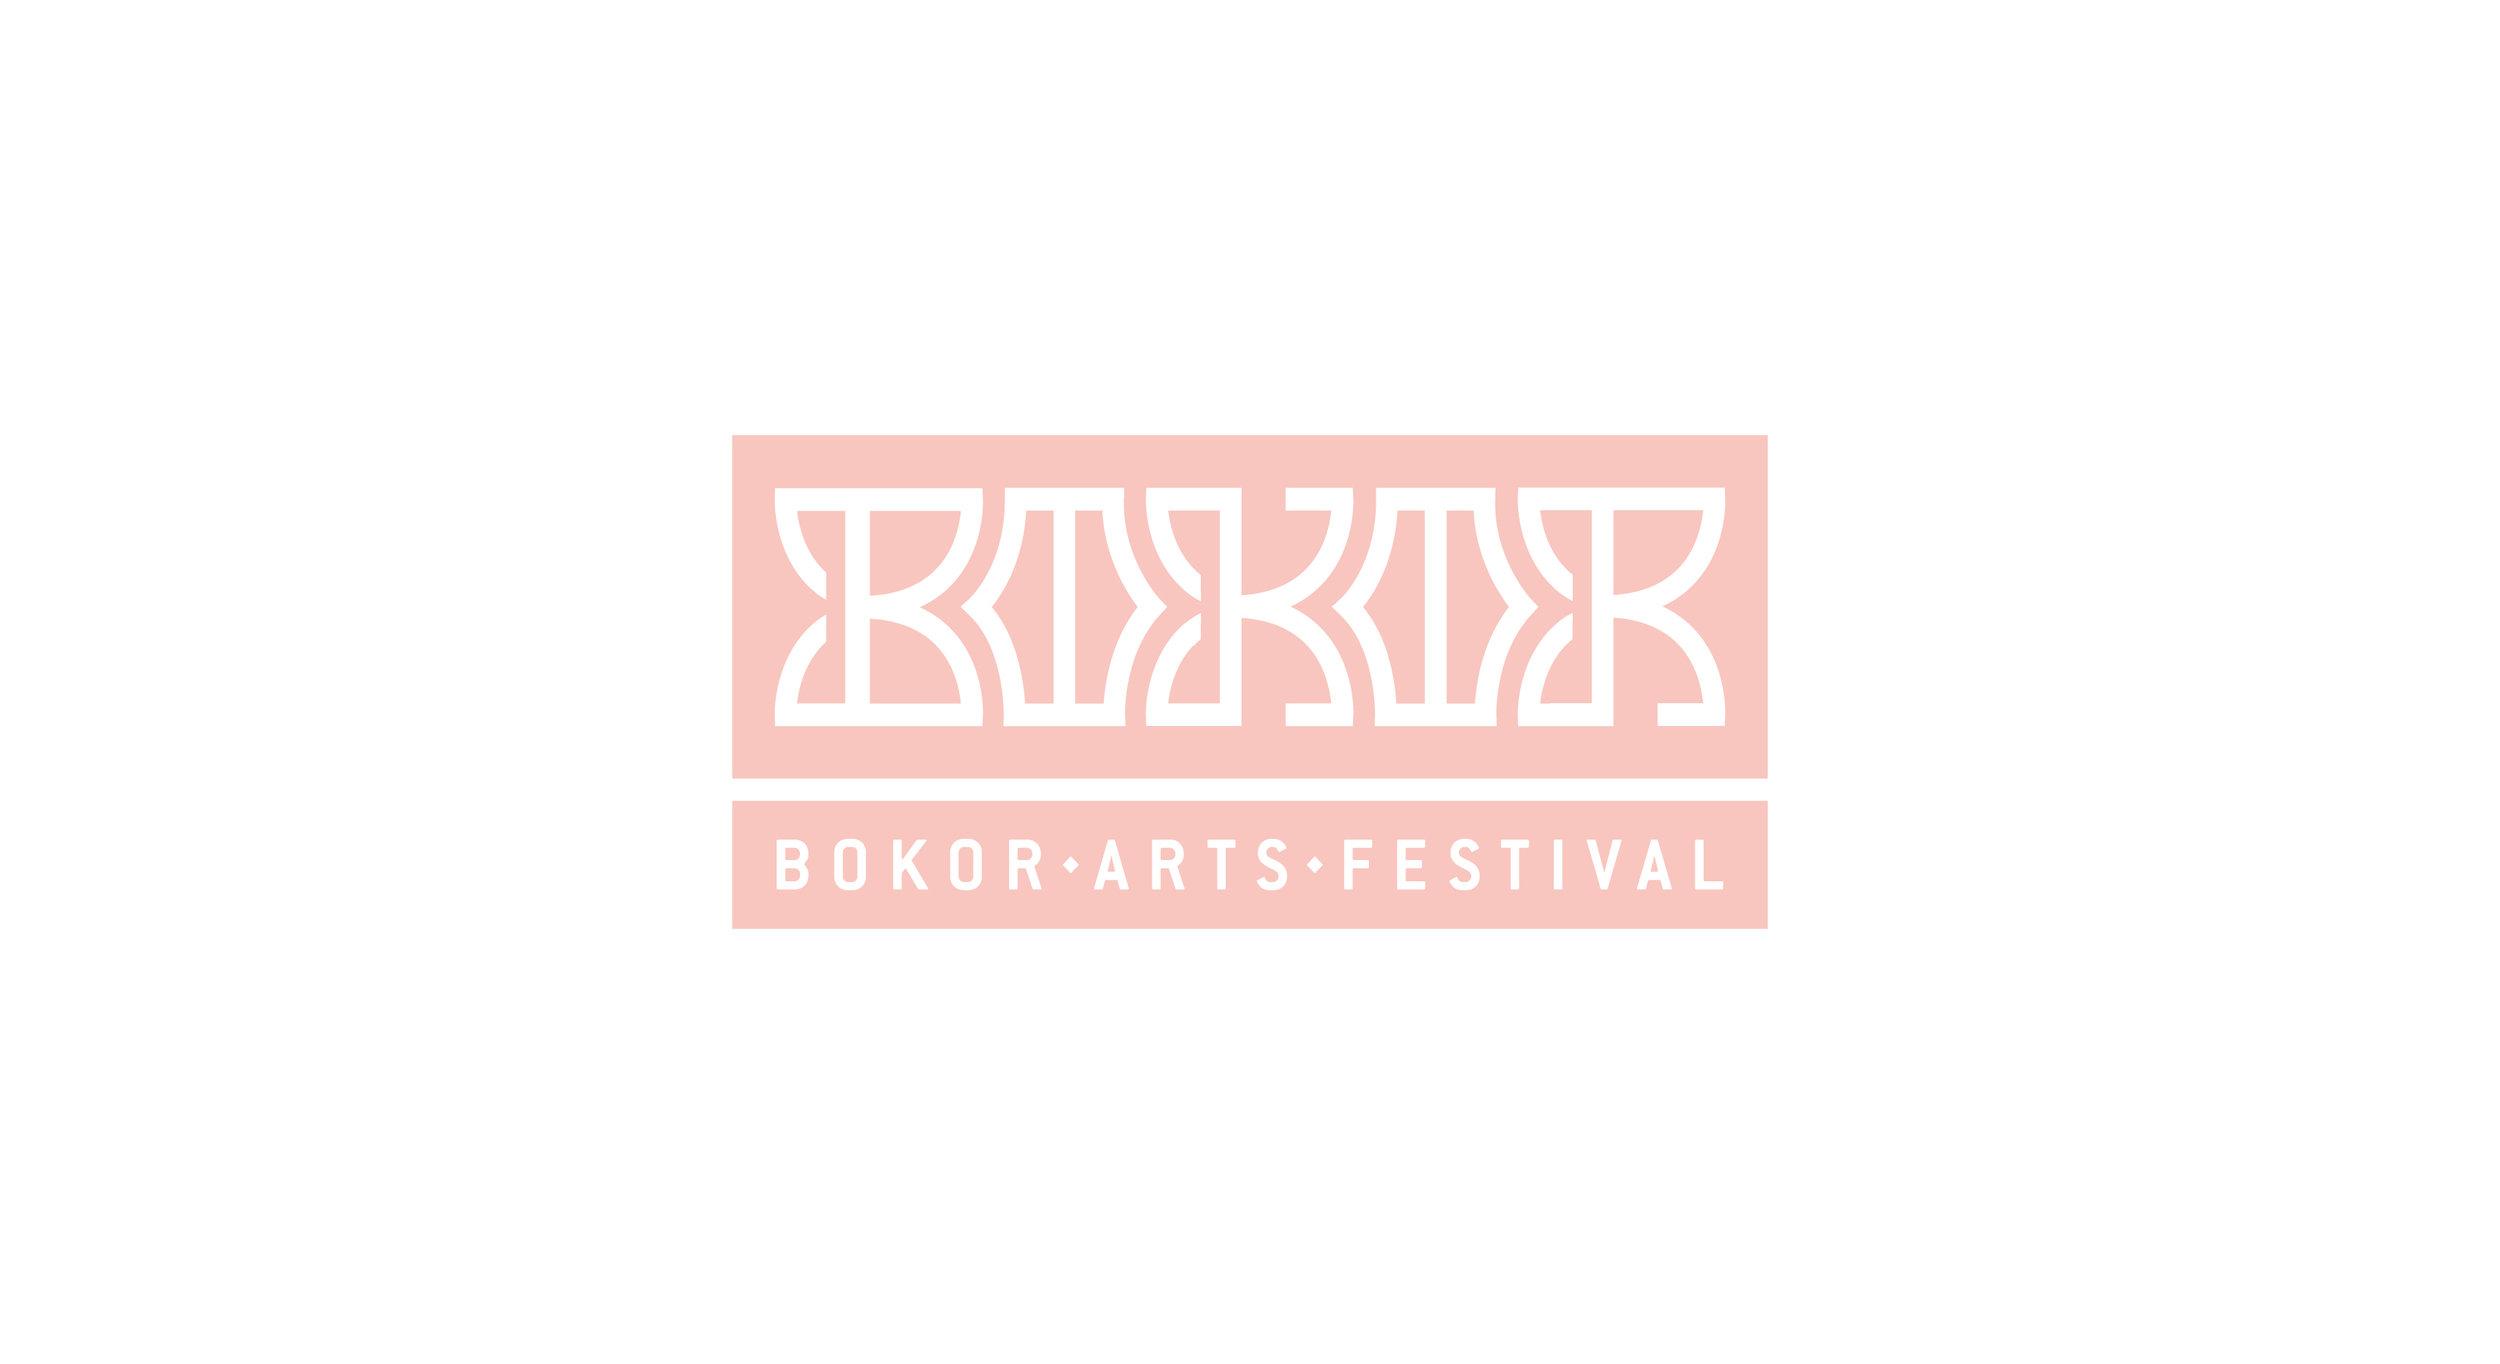 bokor_logo-finals5.jpg